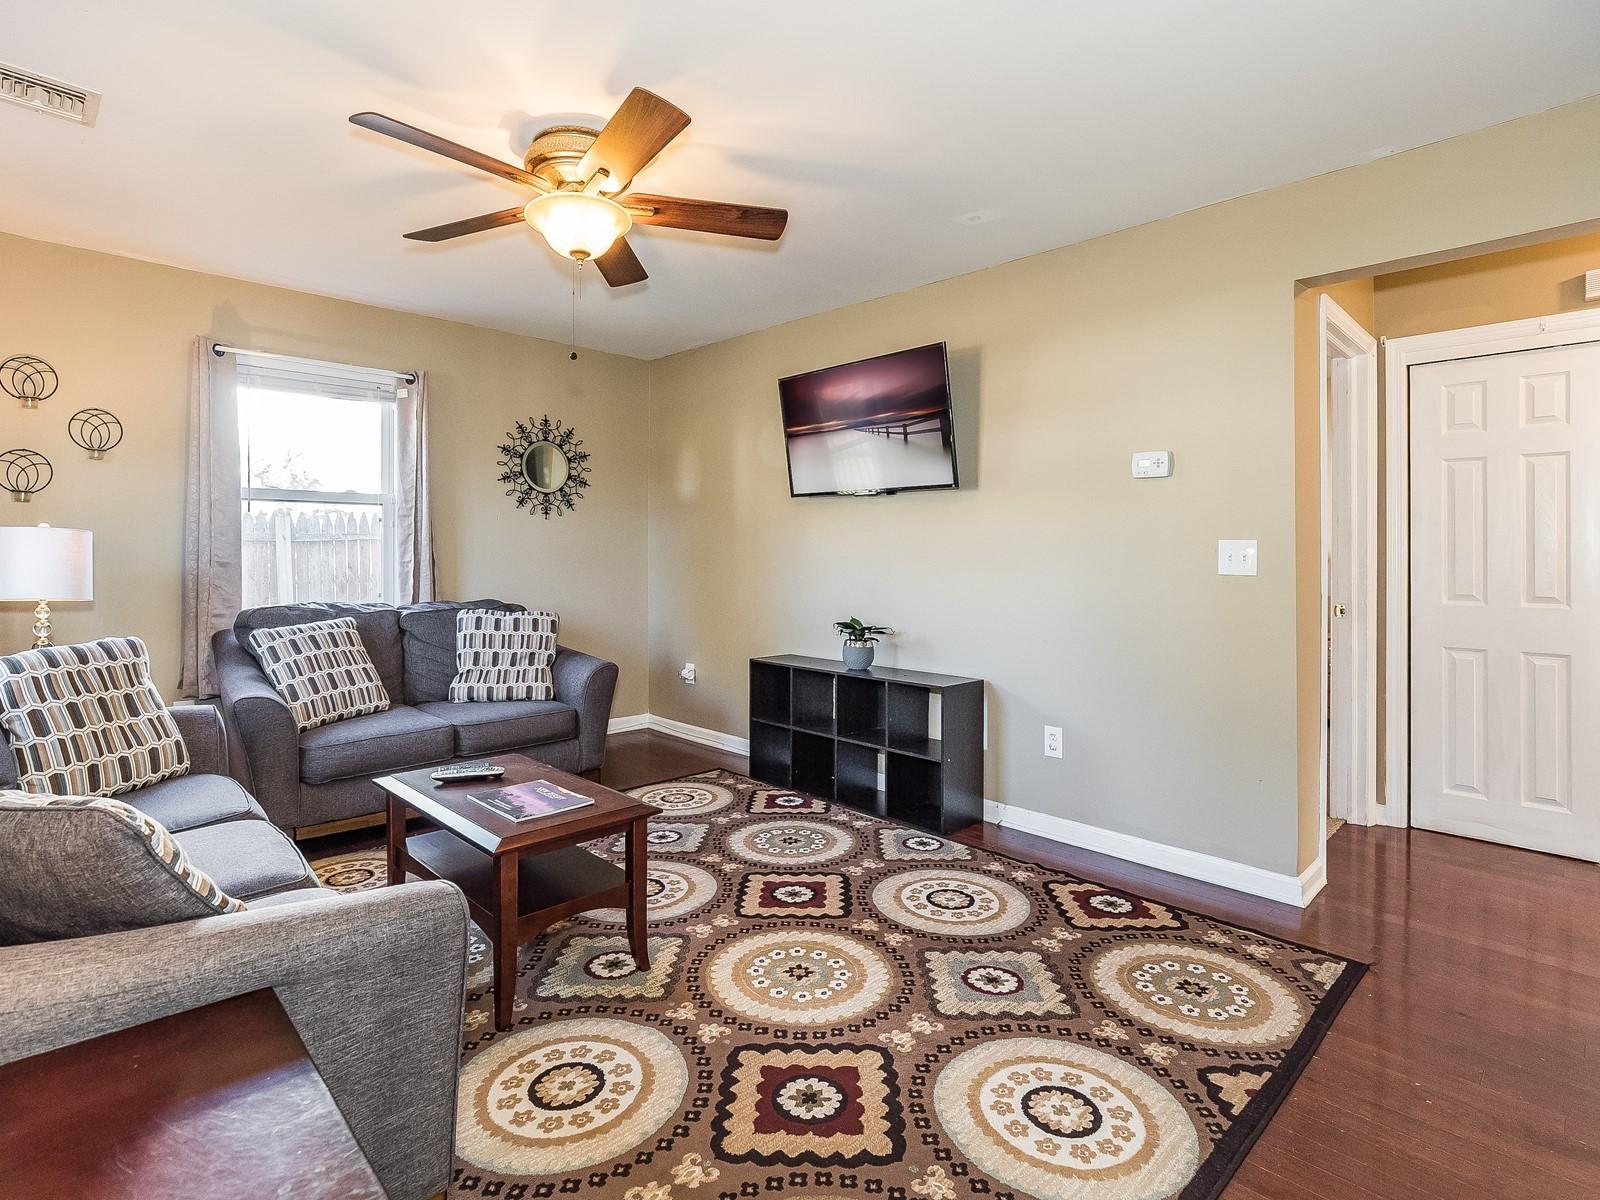 02-Furnished_Apartment_Edison_Living Room2